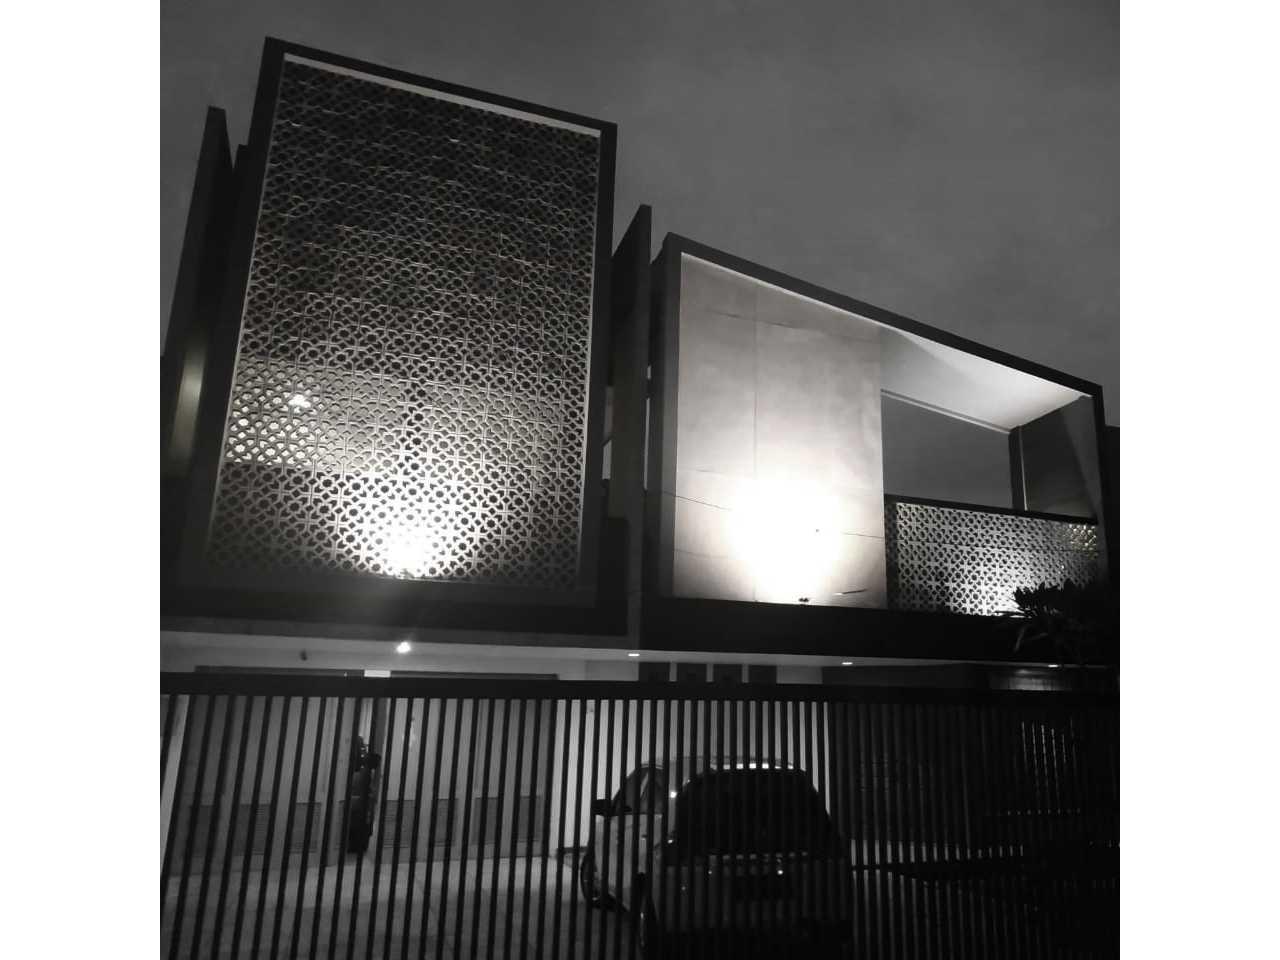 Arsir Architect Aw House Jl. Westhoff No.24, Pasir Kaliki, Kec. Cicendo, Kota Bandung, Jawa Barat 40171, Indonesia Jl. Westhoff No.24, Pasir Kaliki, Kec. Cicendo, Kota Bandung, Jawa Barat 40171, Indonesia Arsir-Architect-Aw-House Contemporary  113197